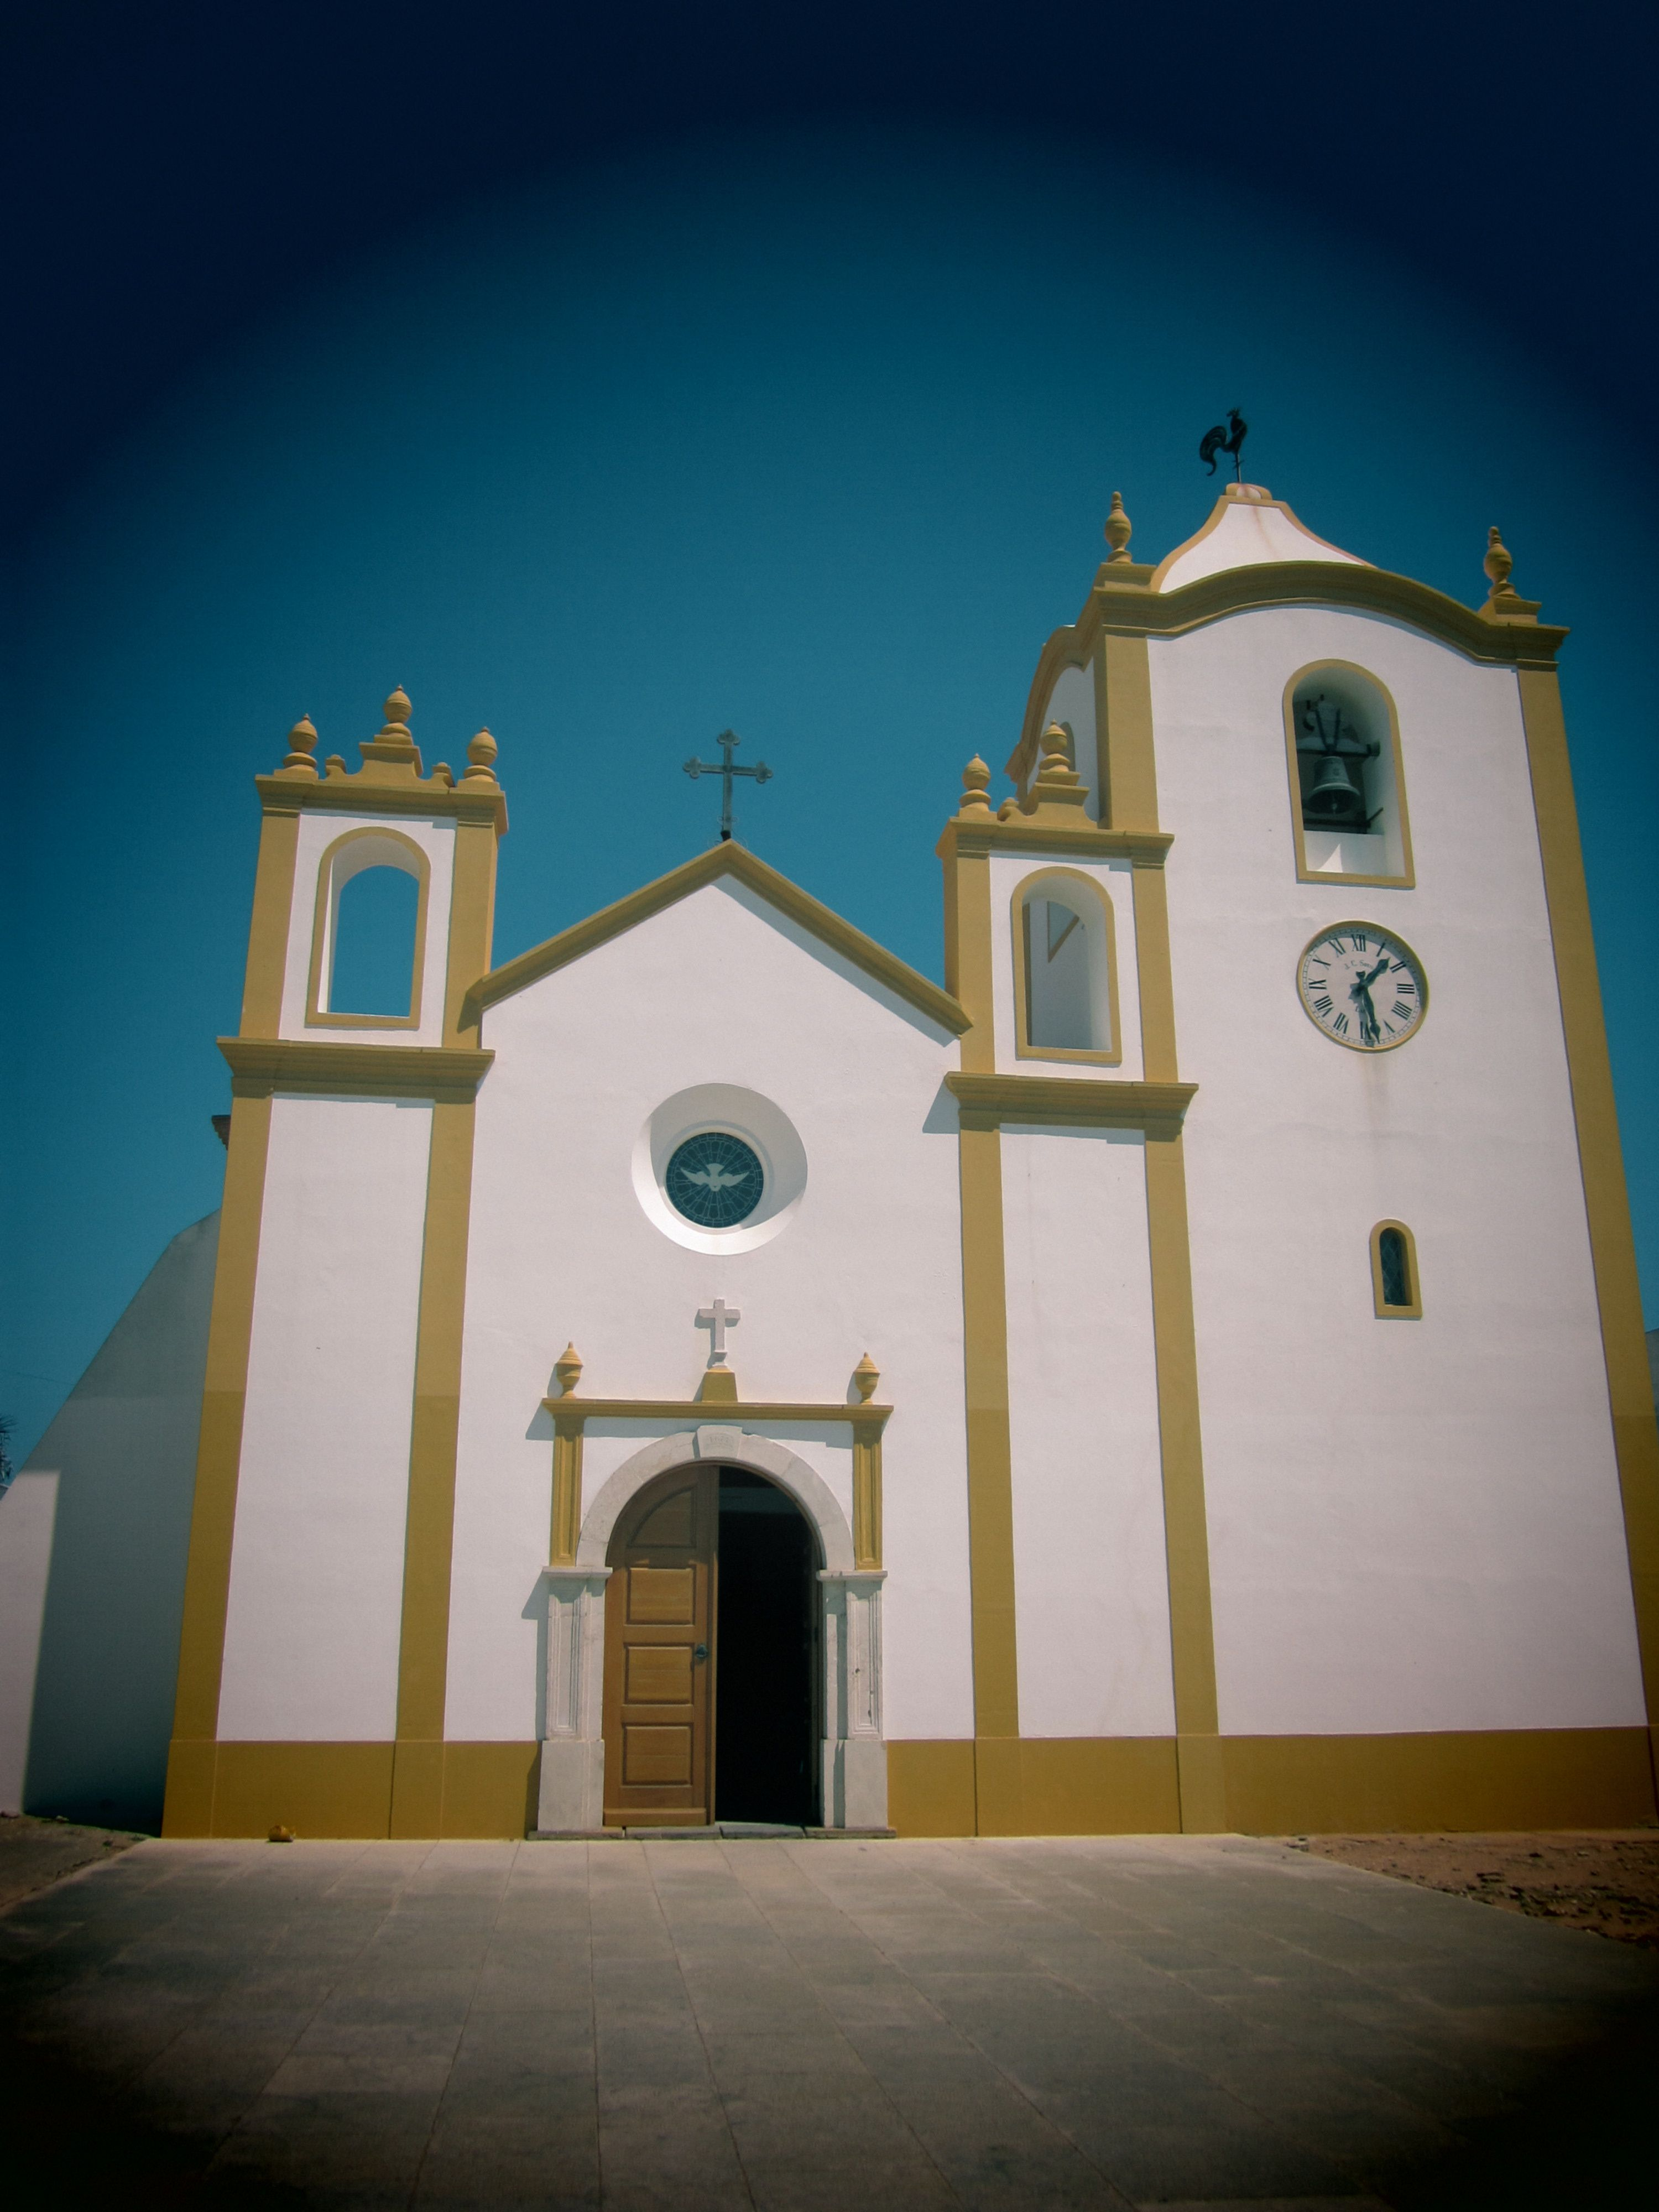 The church in Praia da luz  #portugal #algarve